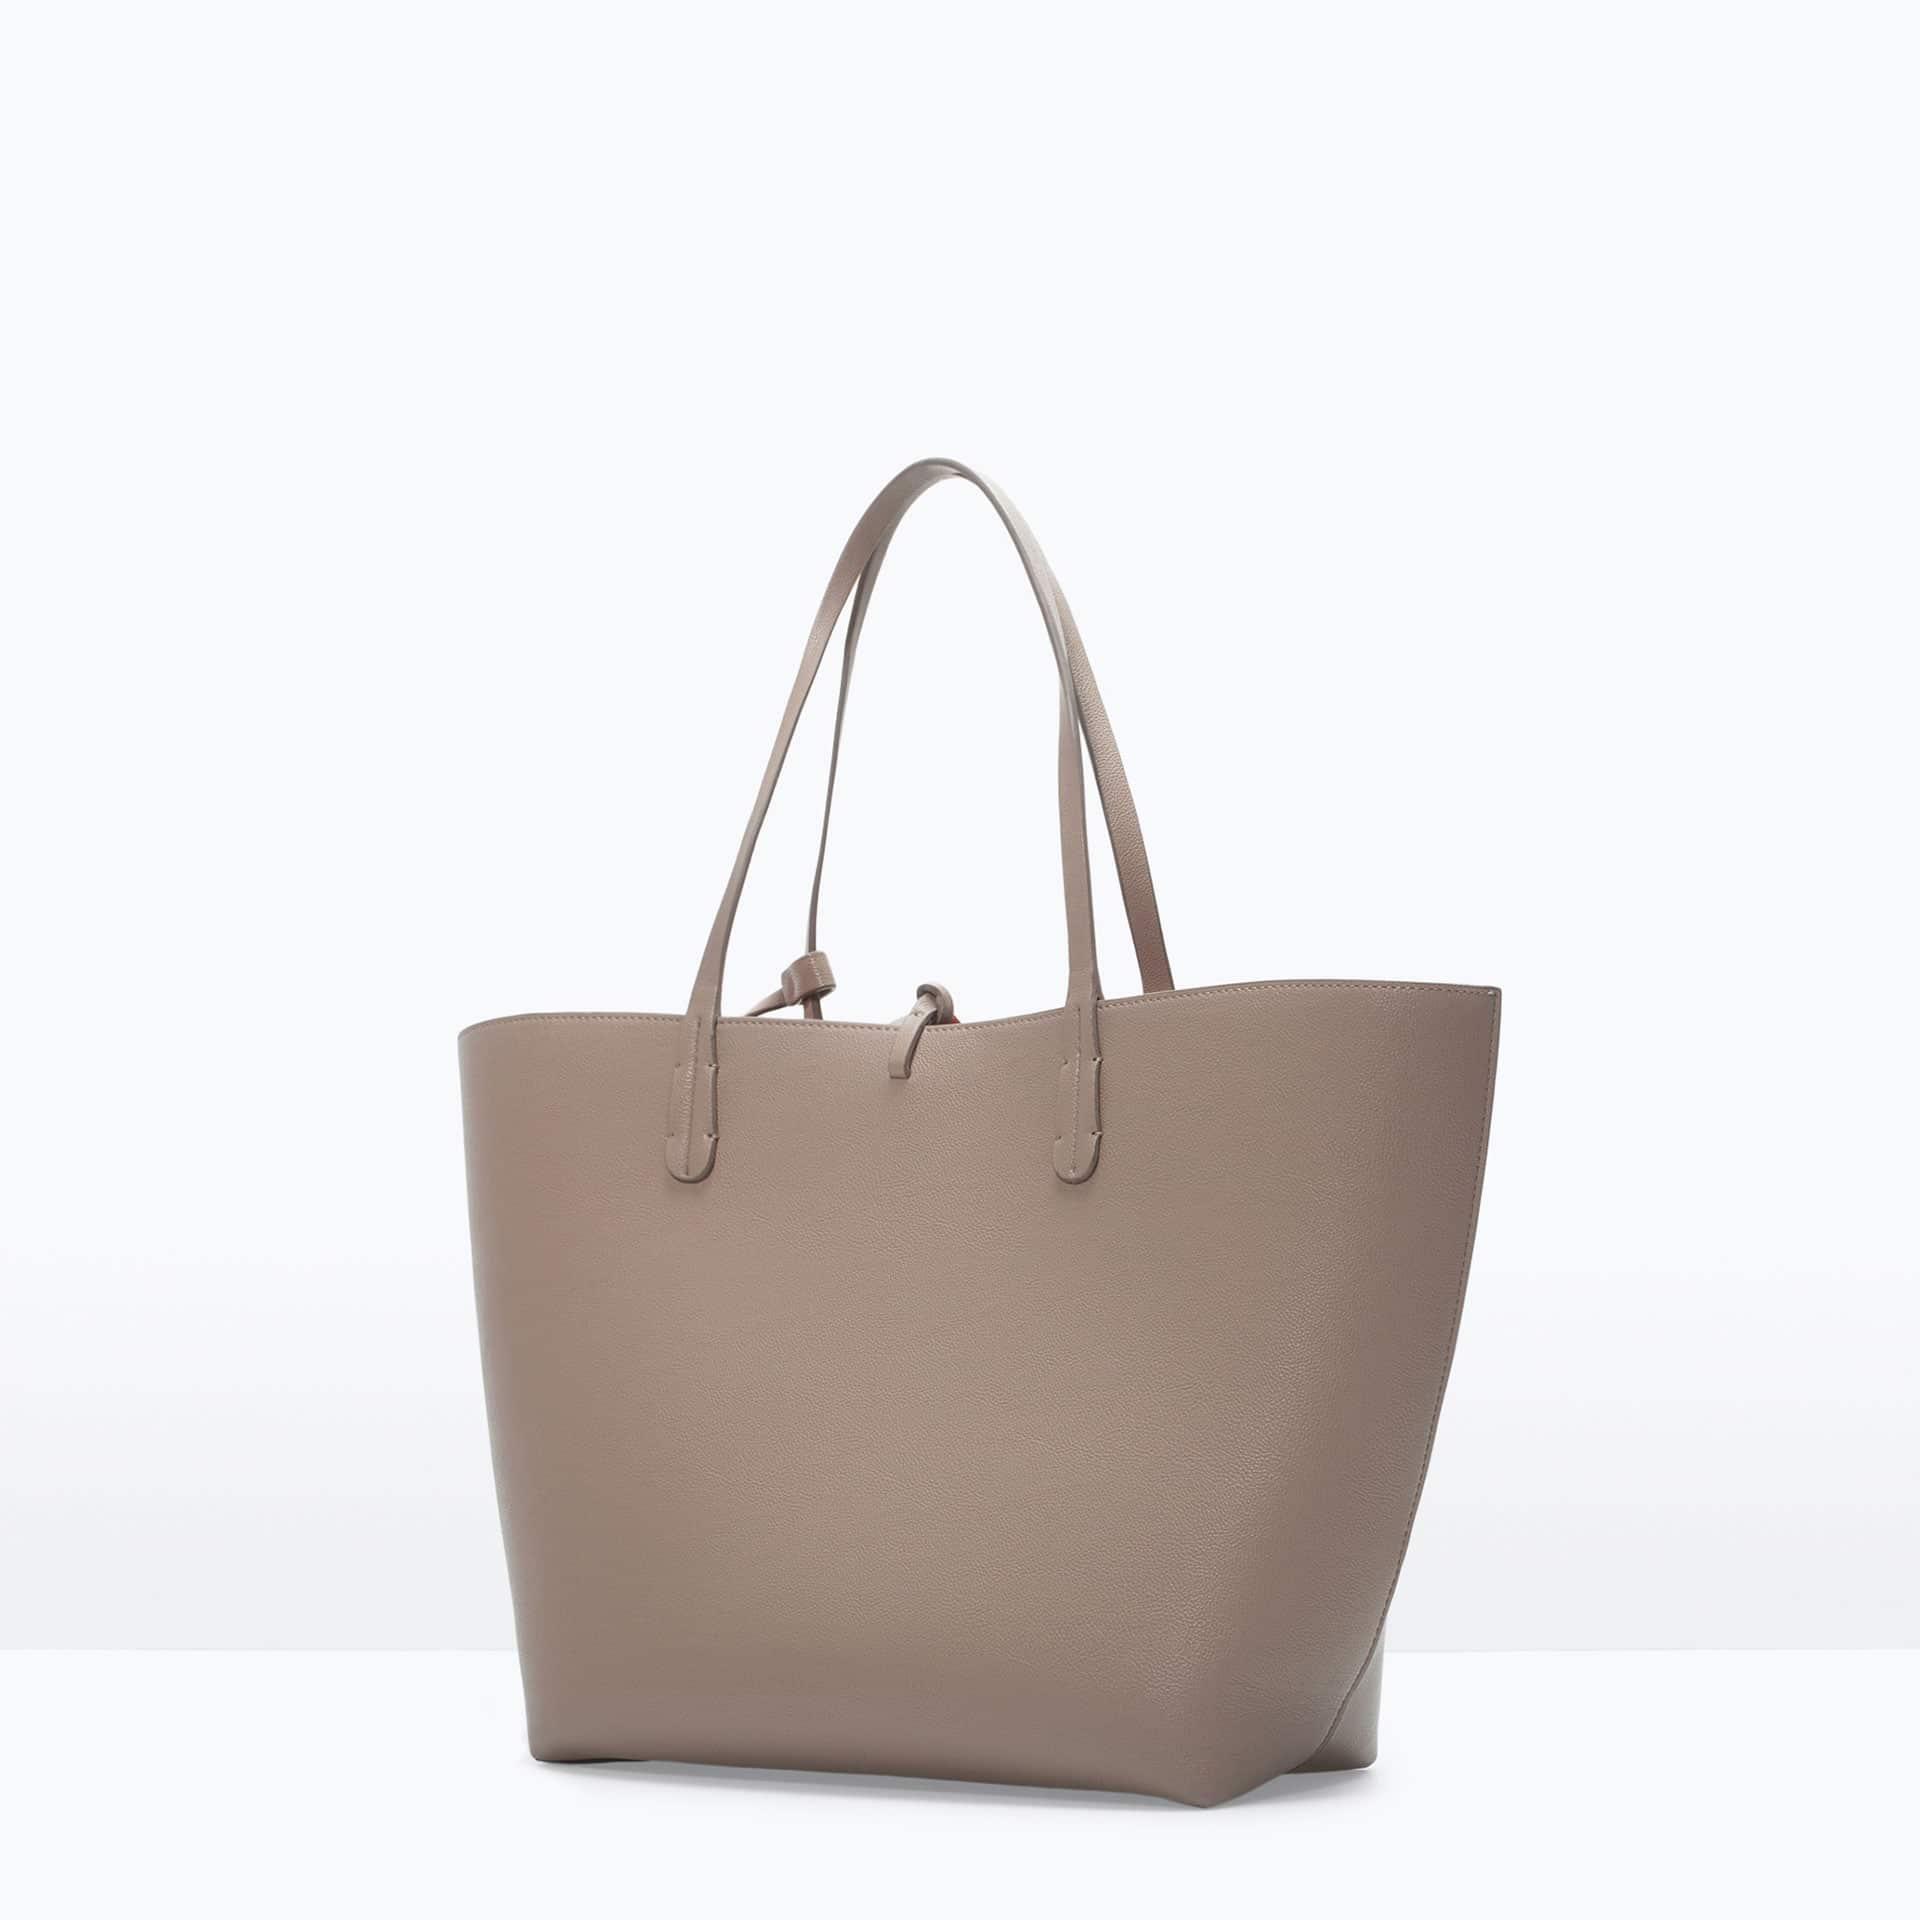 Online Handbags Ping Handbag Reviews 2017